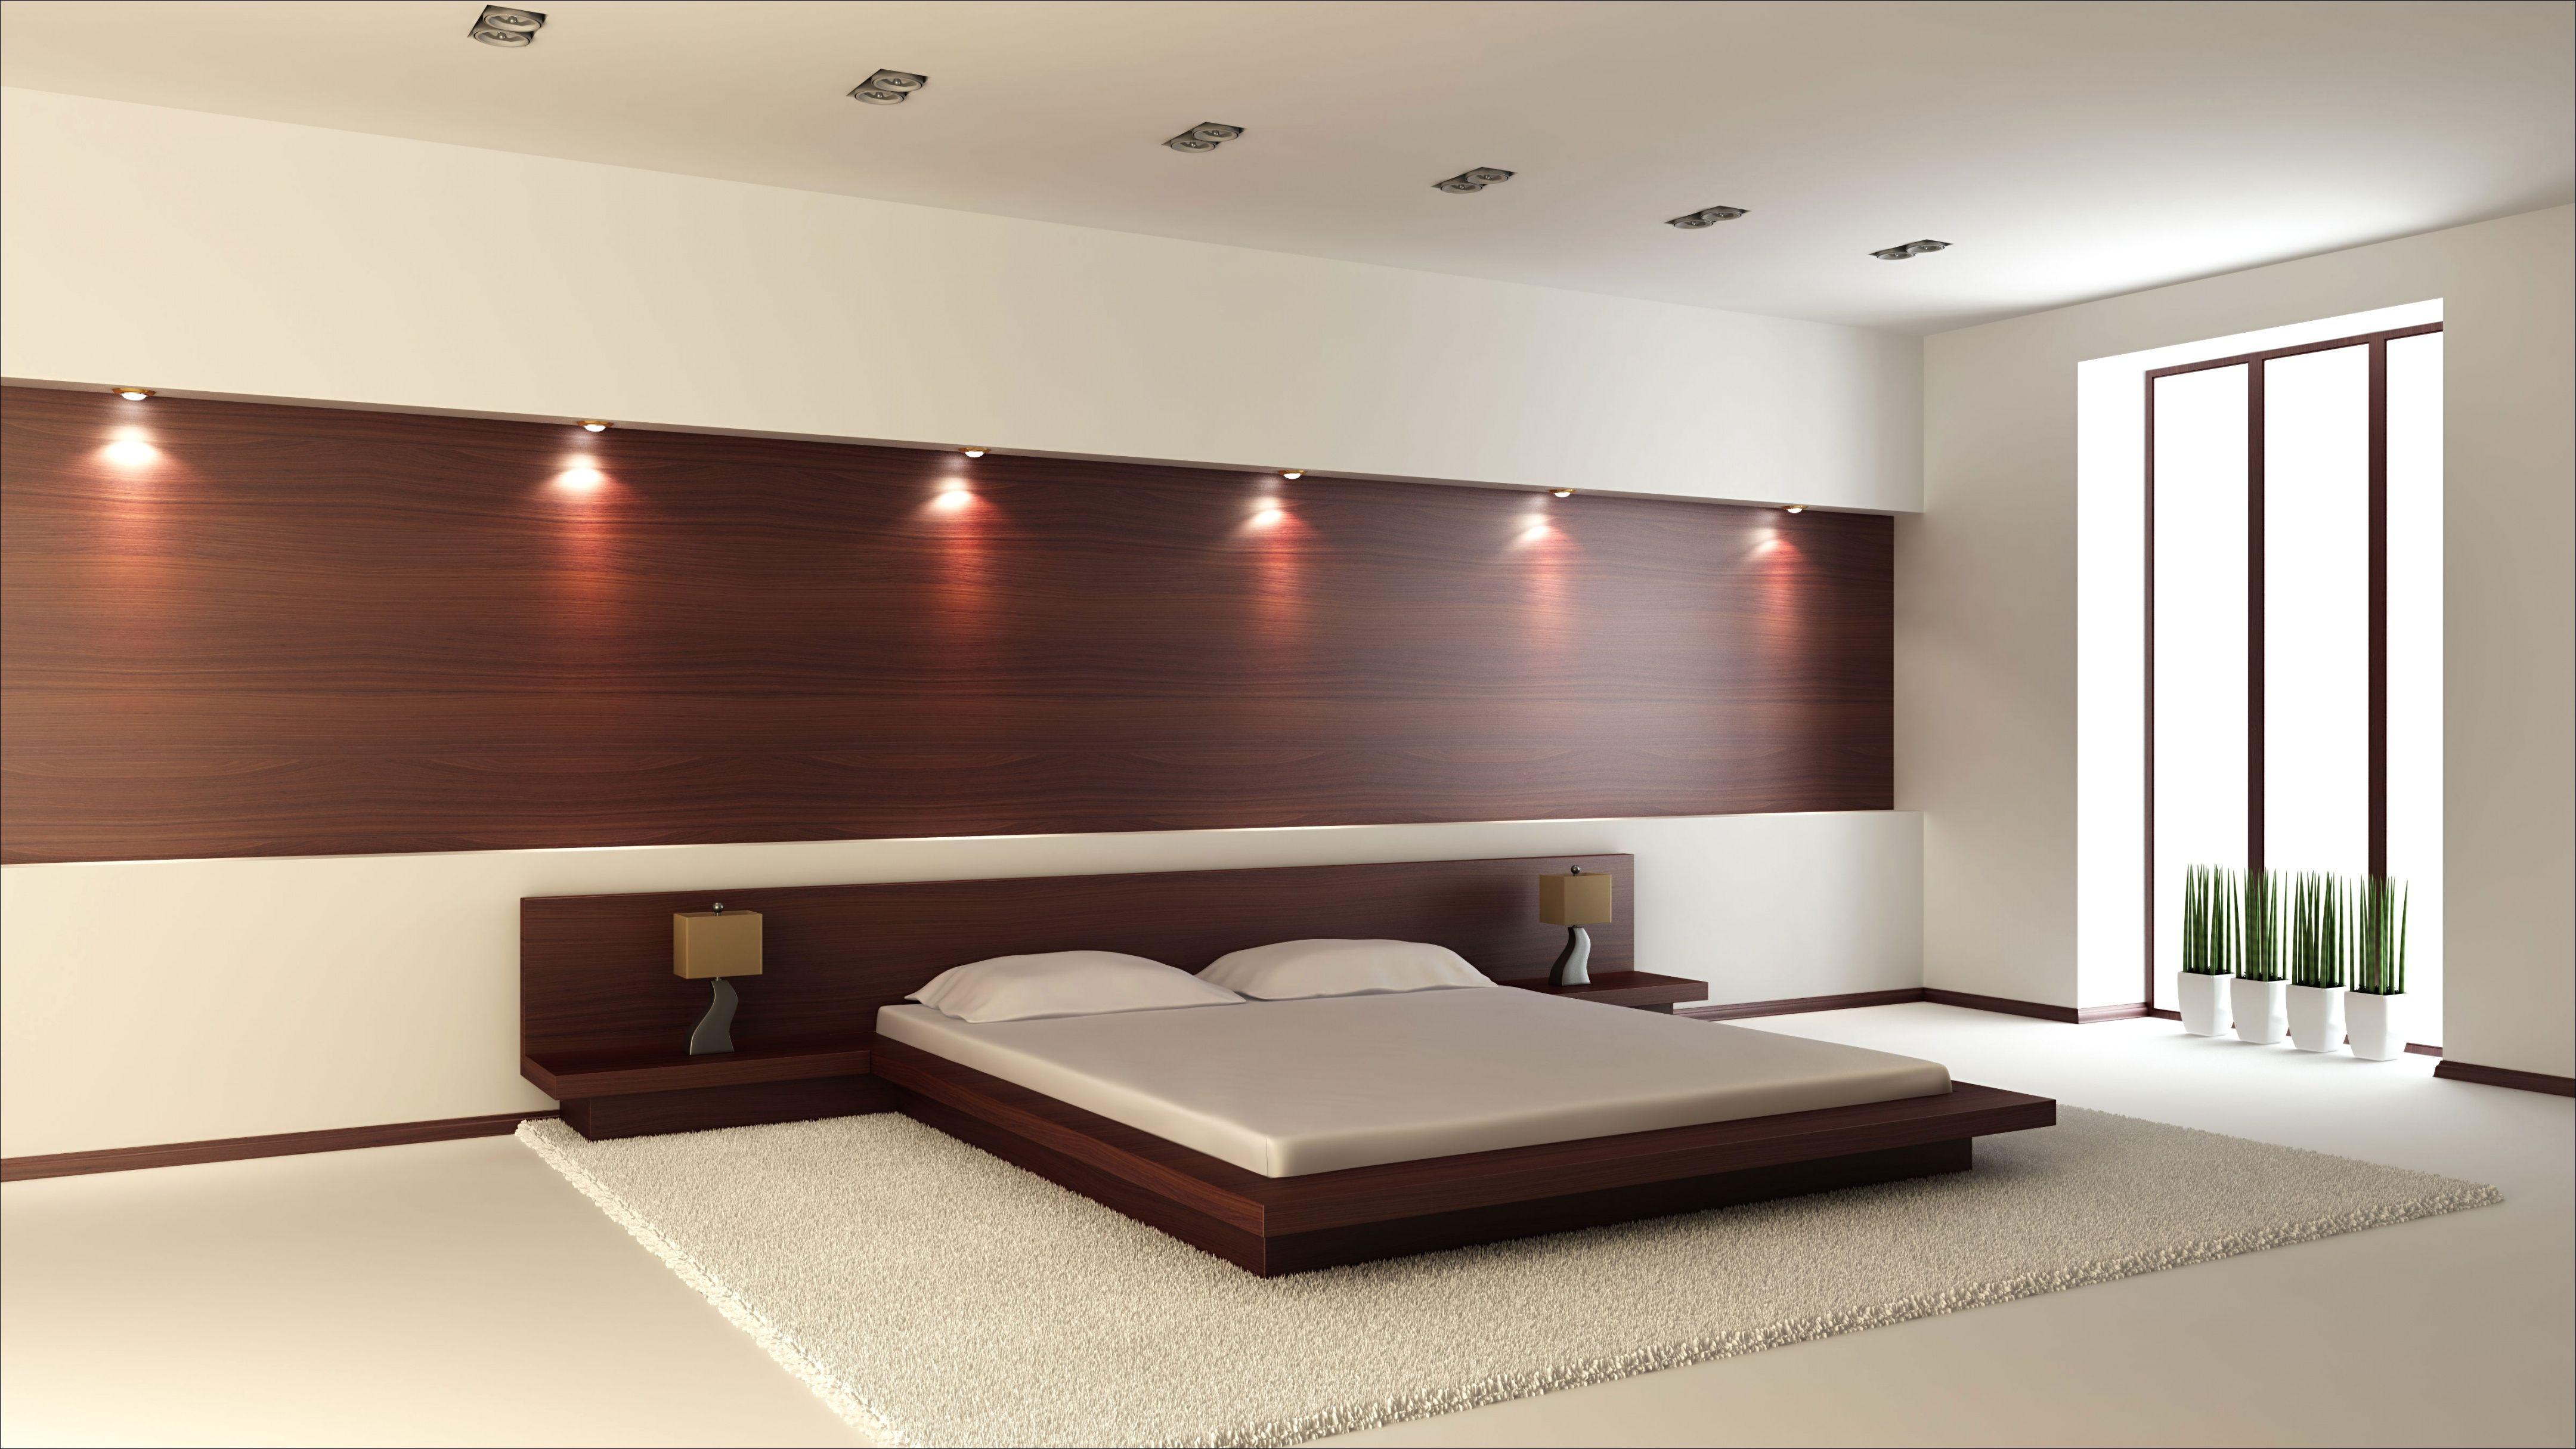 Japanese Style Bedroom Furniture Pics Japan World Web Senryaku Info Modern Bedroom Mid Century Modern Bedroom Furniture Mid Century Modern Bedroom